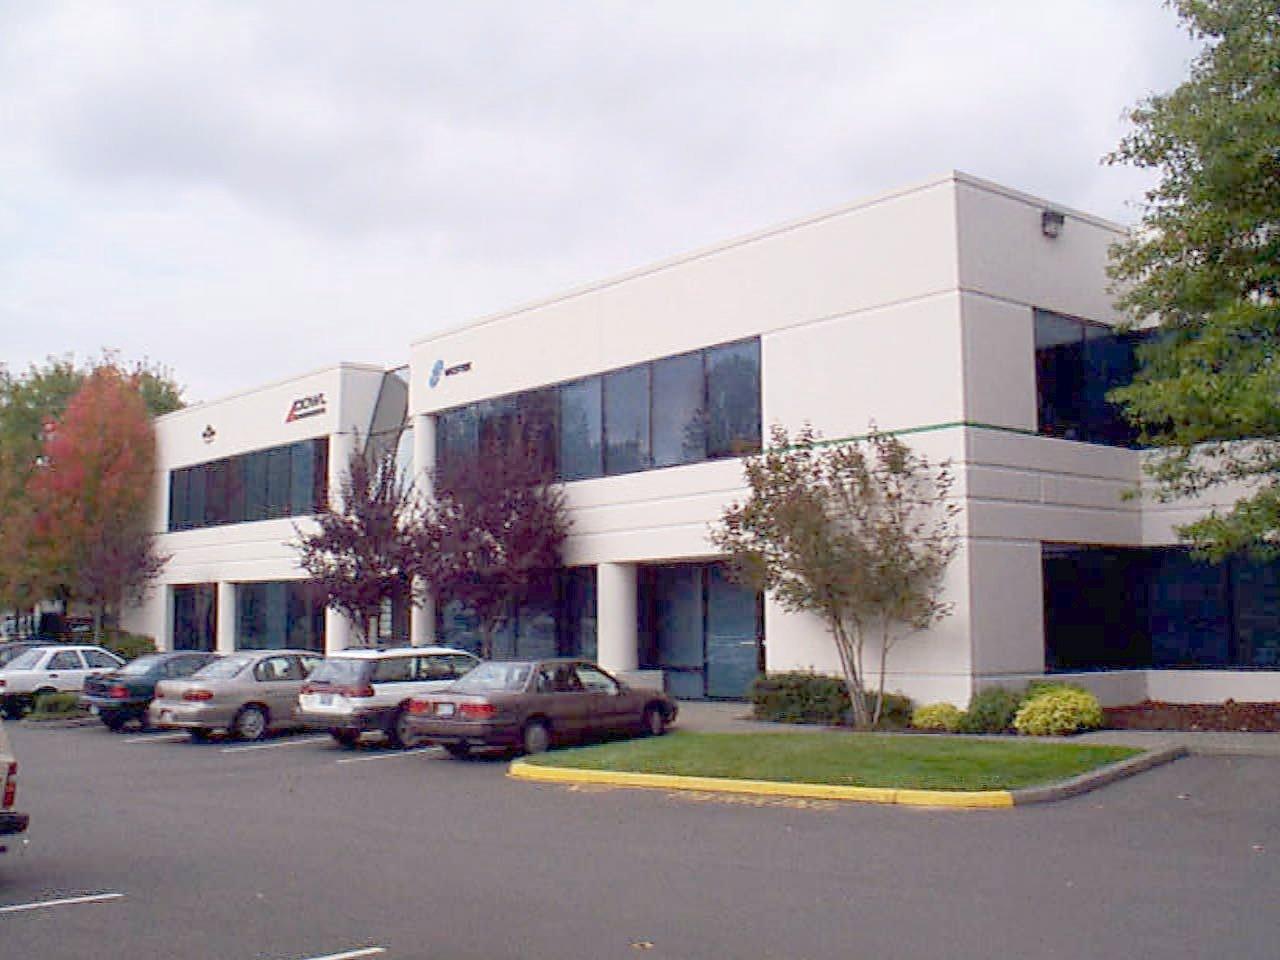 8410 154th Ave NE #240 Property Photo - Redmond, WA real estate listing